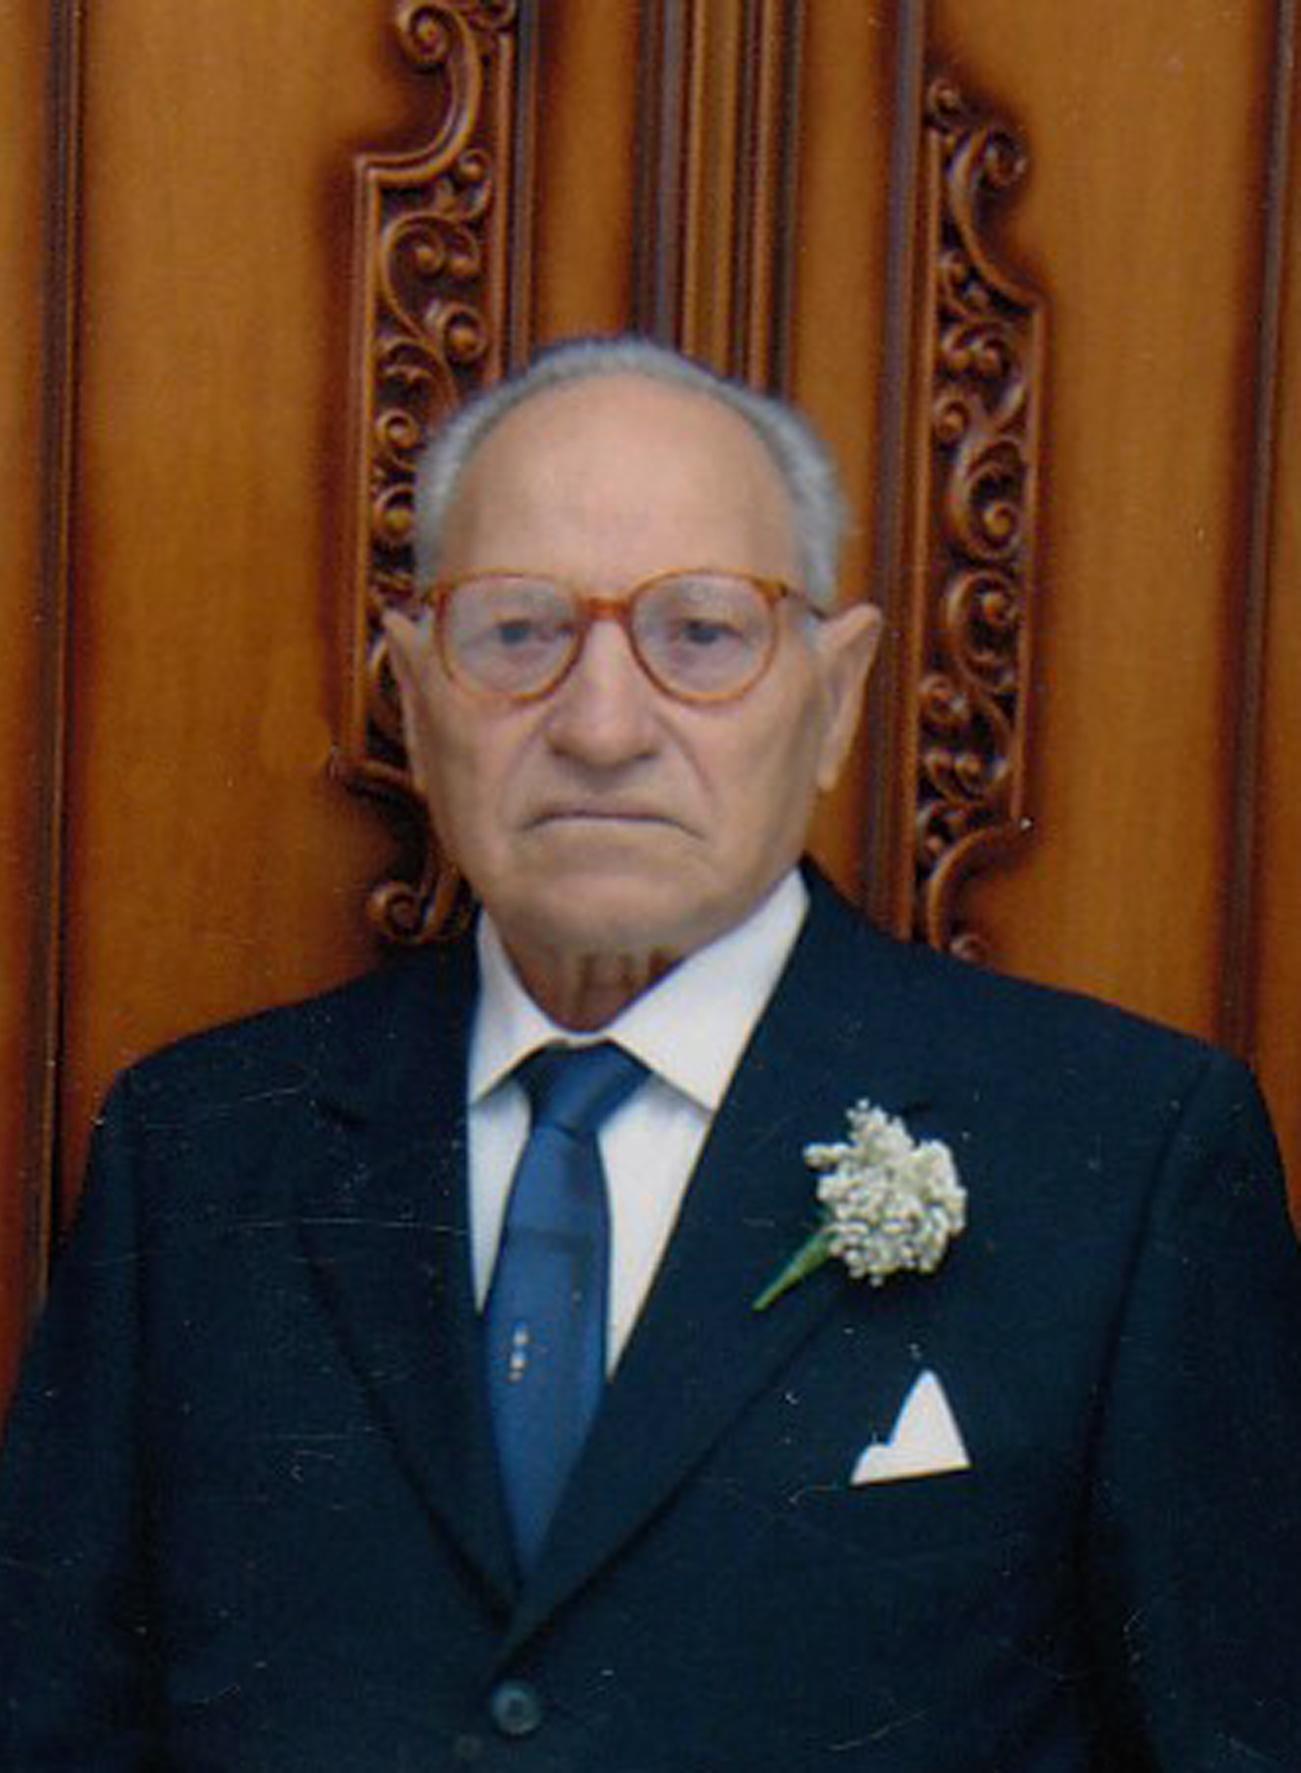 Necrologi Venaria Reale - PASQUALE FERRERA